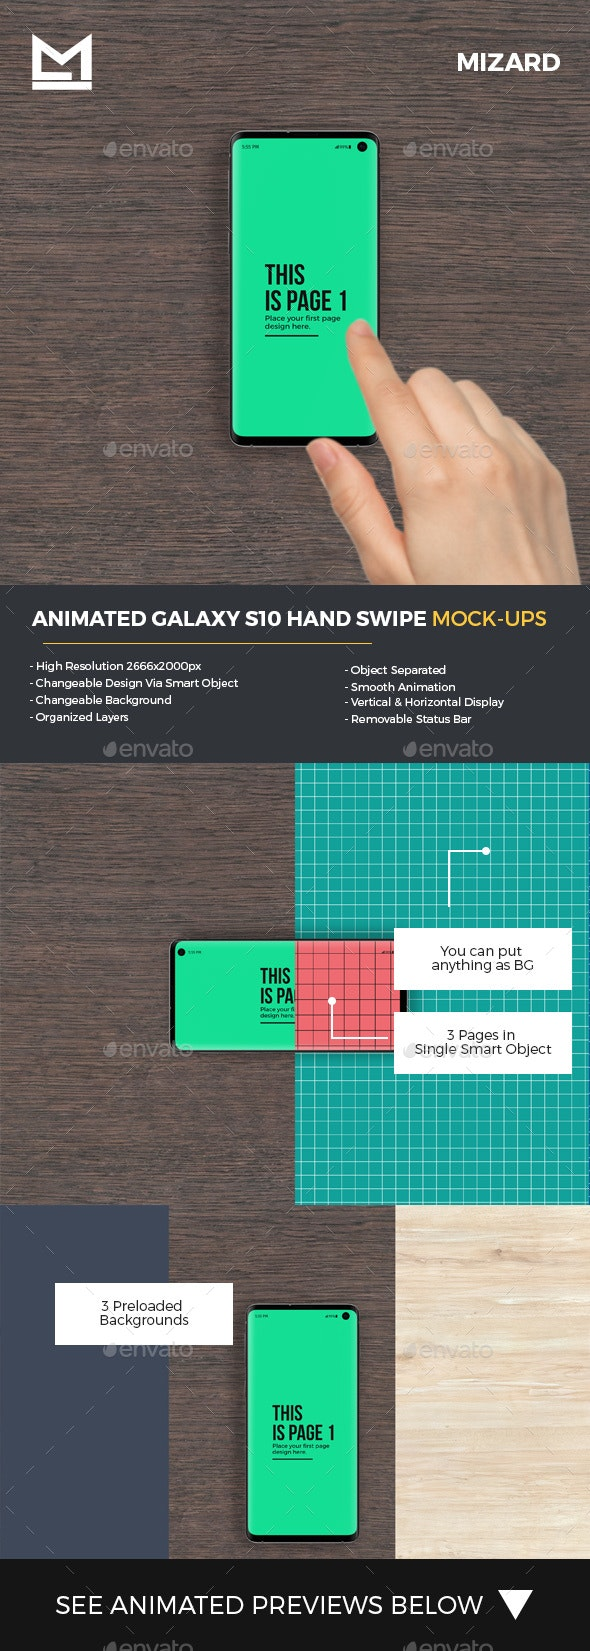 Animated S10 Galaxy Hand Swipe Mockup - Mobile Displays